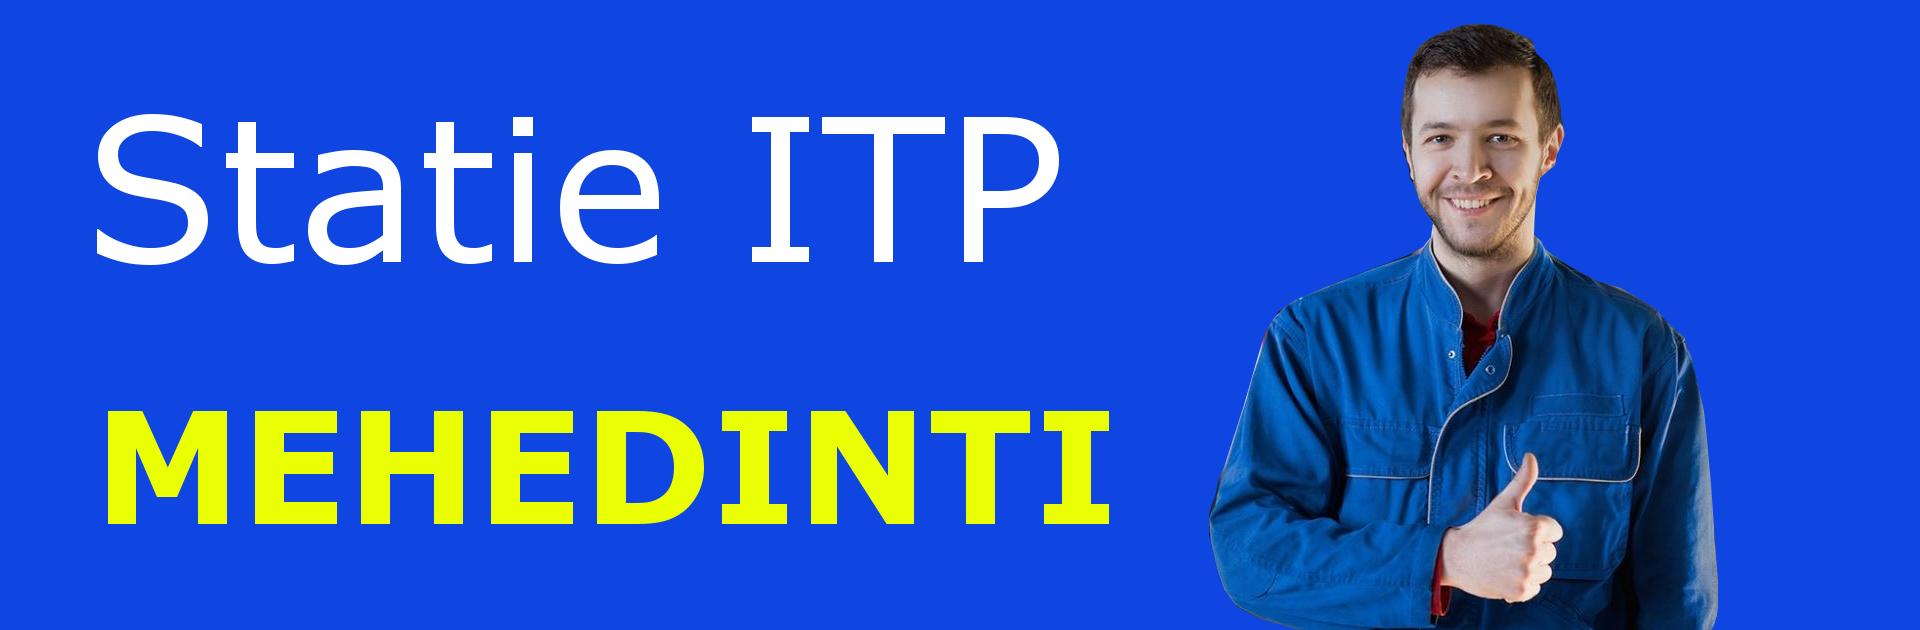 Banner ITP MEHEDINTI